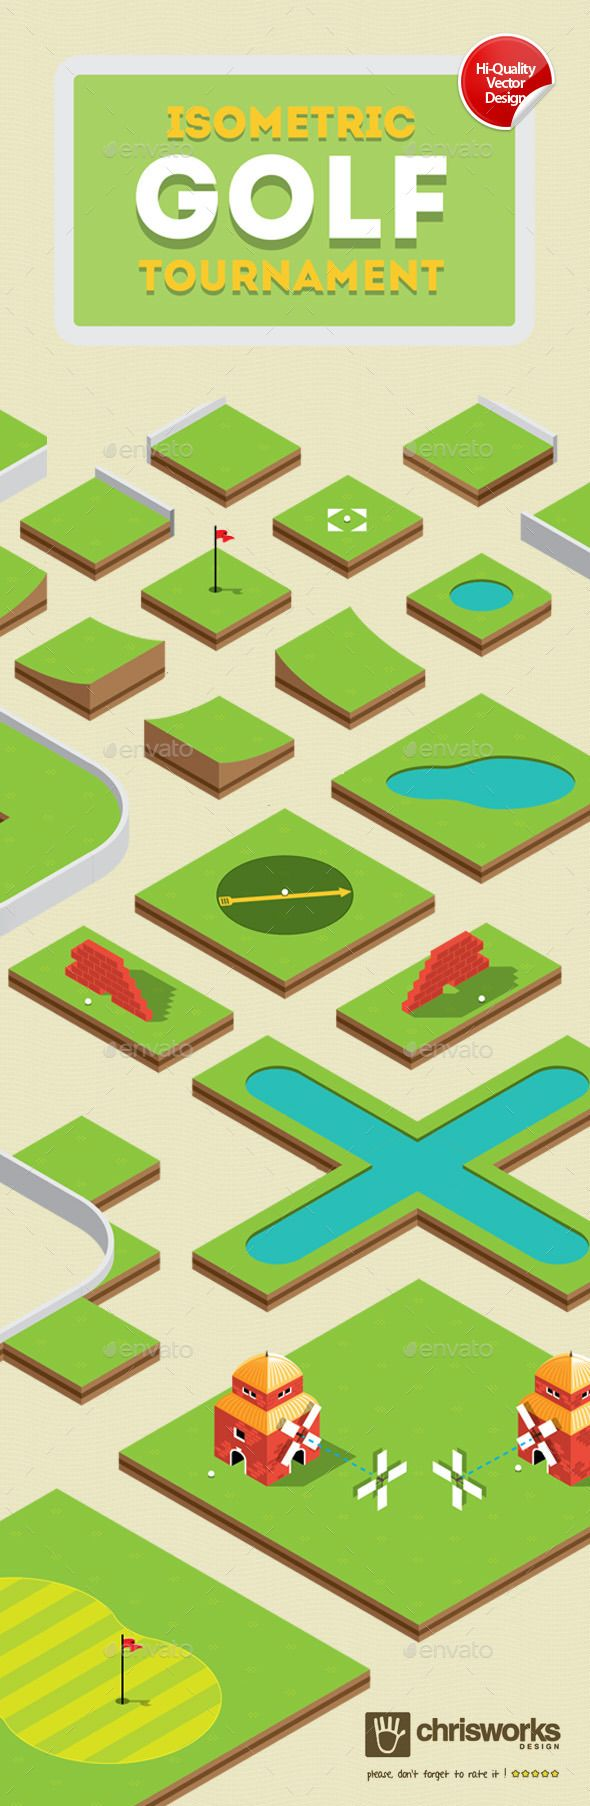 Isometric Golf Gamekit - Tilesets Game Assets